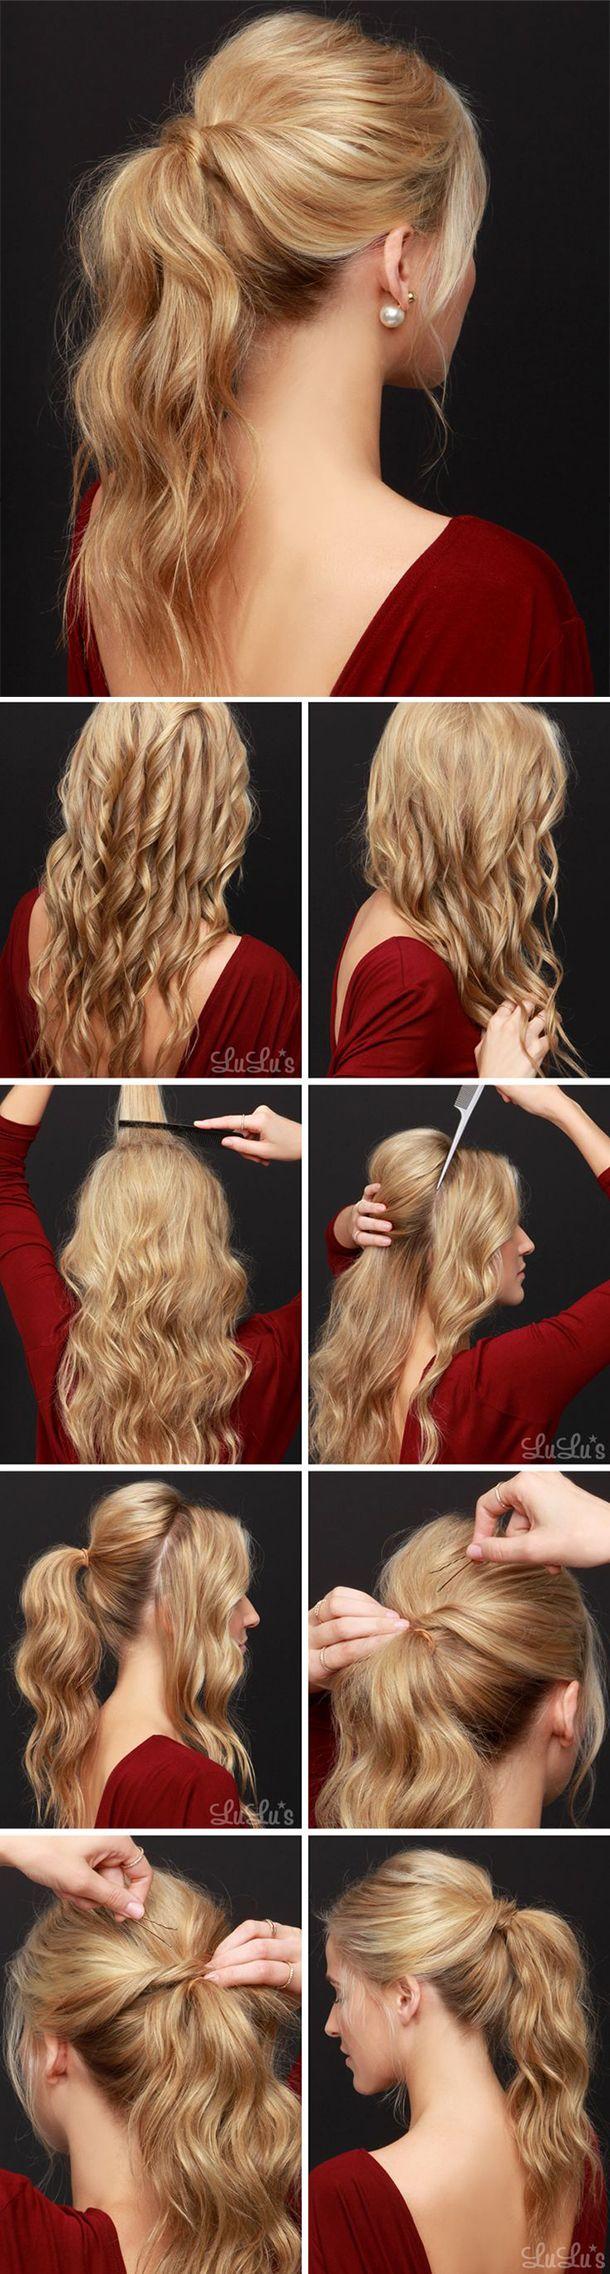 Prom Hair Styles                                                                                                                                                                                 Más                                                                                                                                                                                 Más